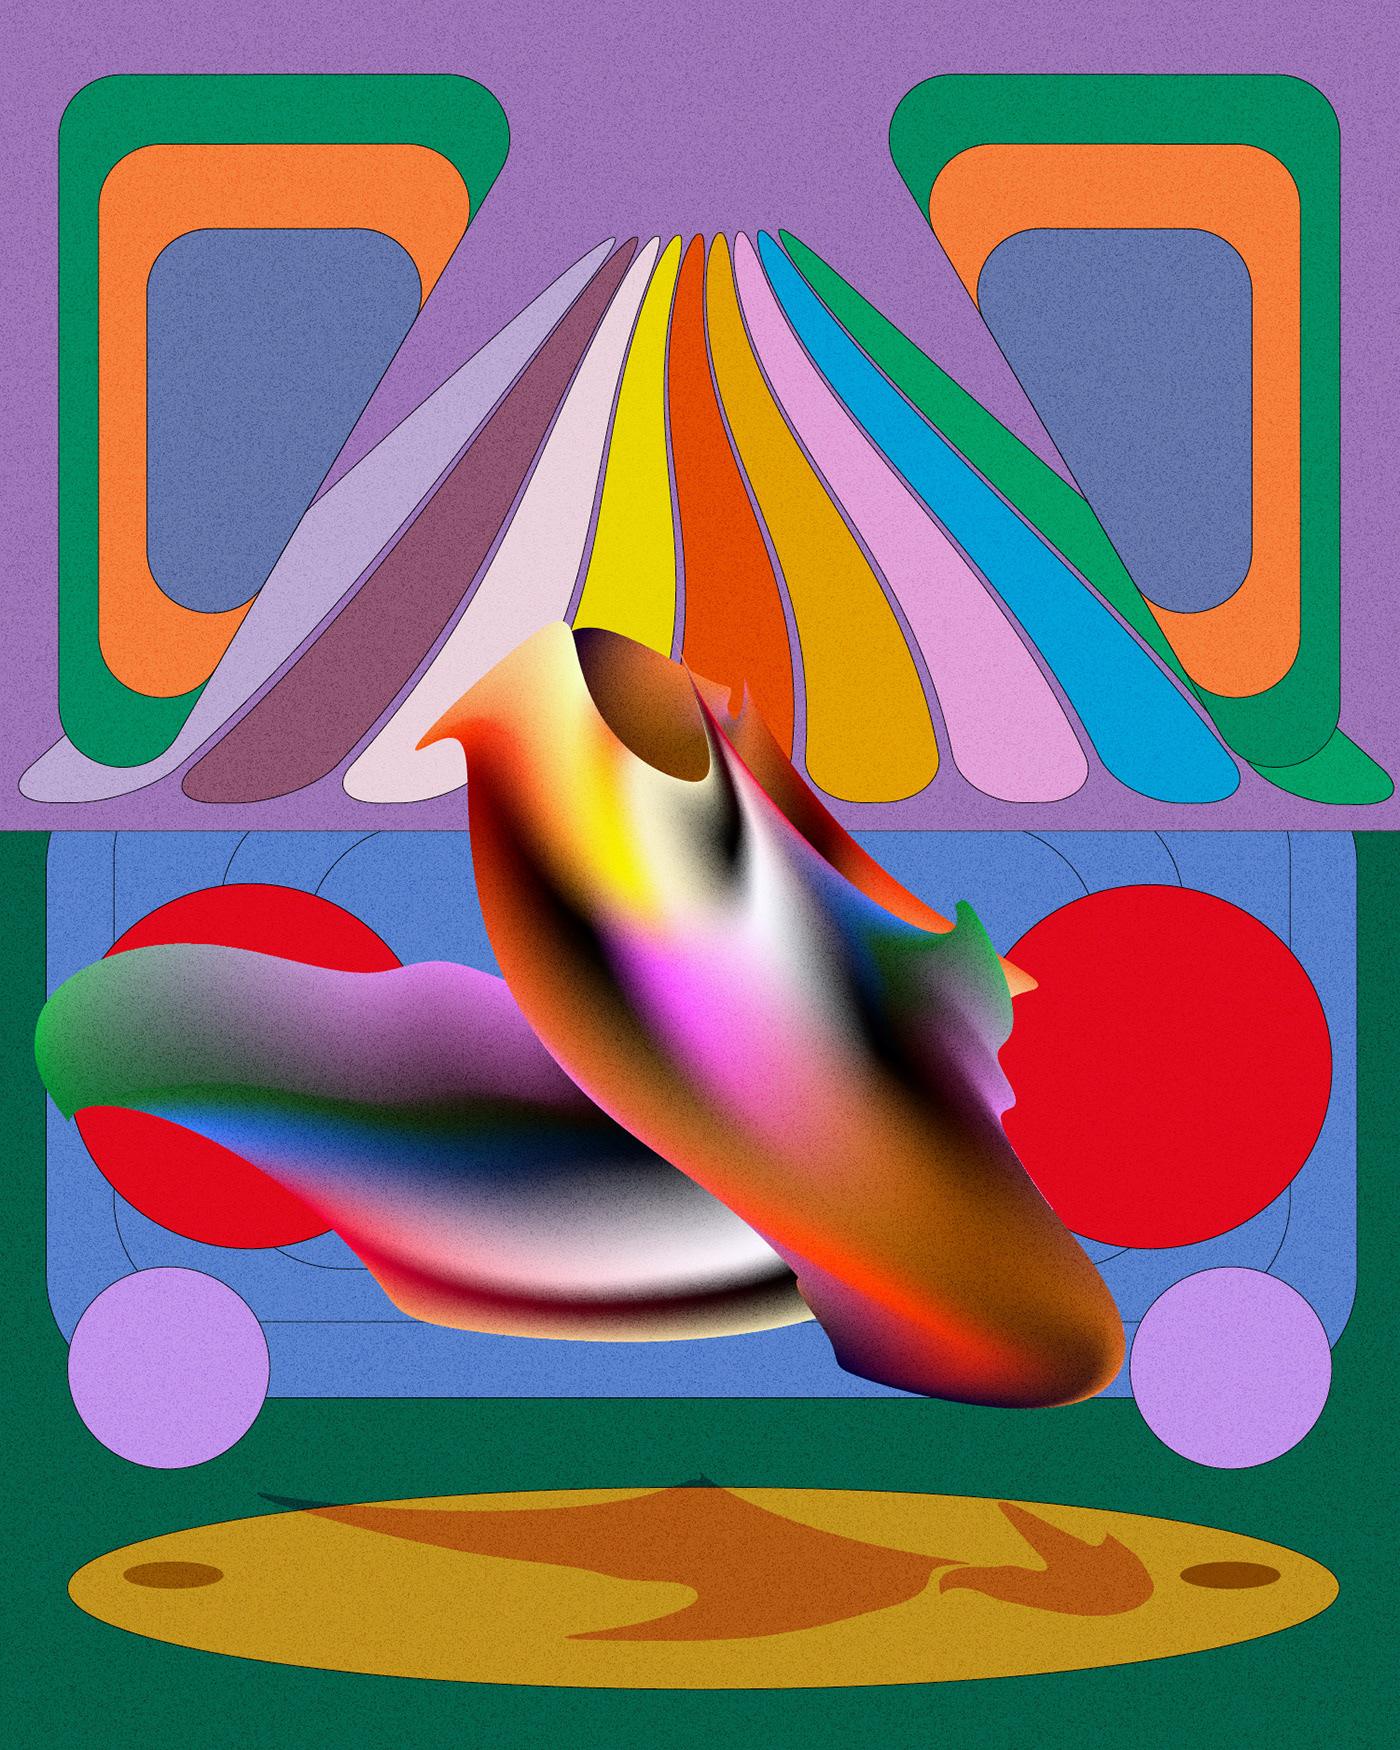 art arte artist dibujo digitalart Drawing  graphicdesign ILLUSTRATION  Illustrator poster